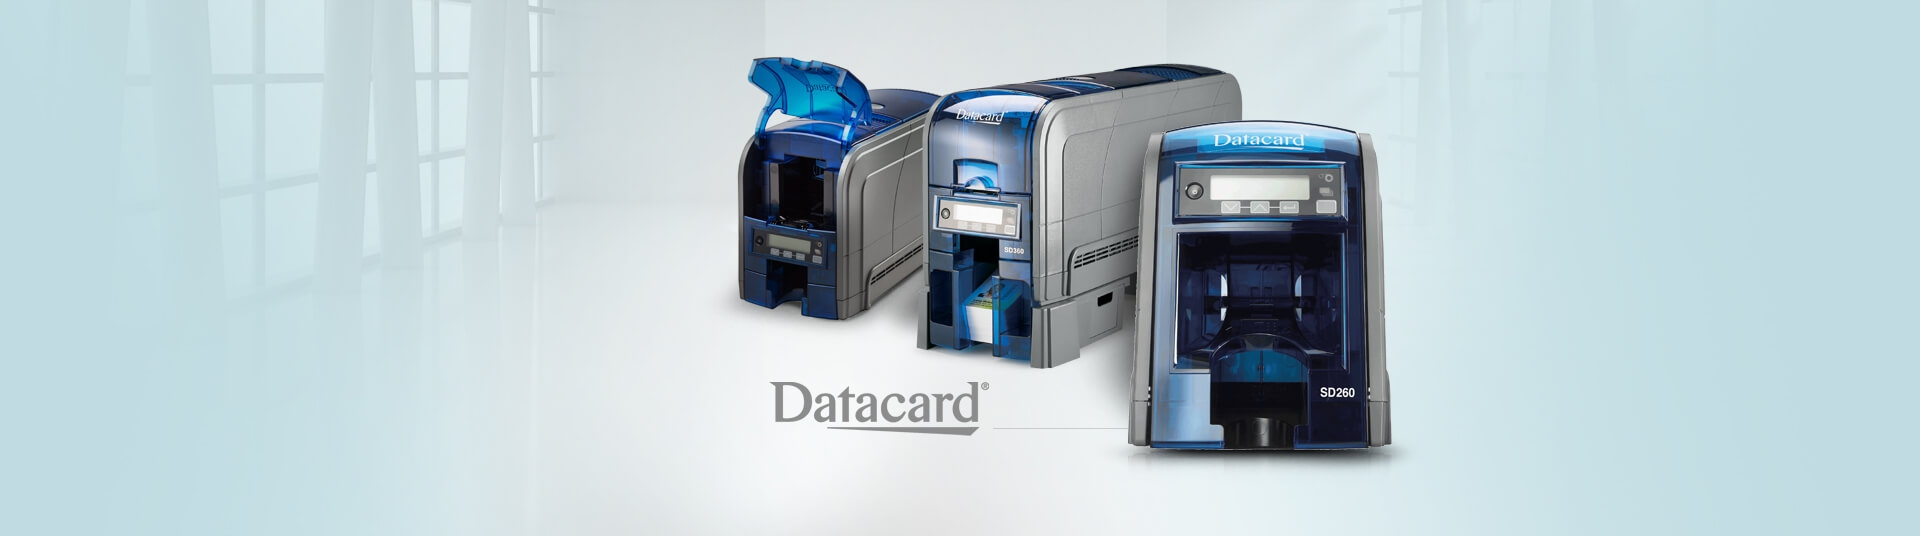 Entrust Datacard SD160 ID Card Printers